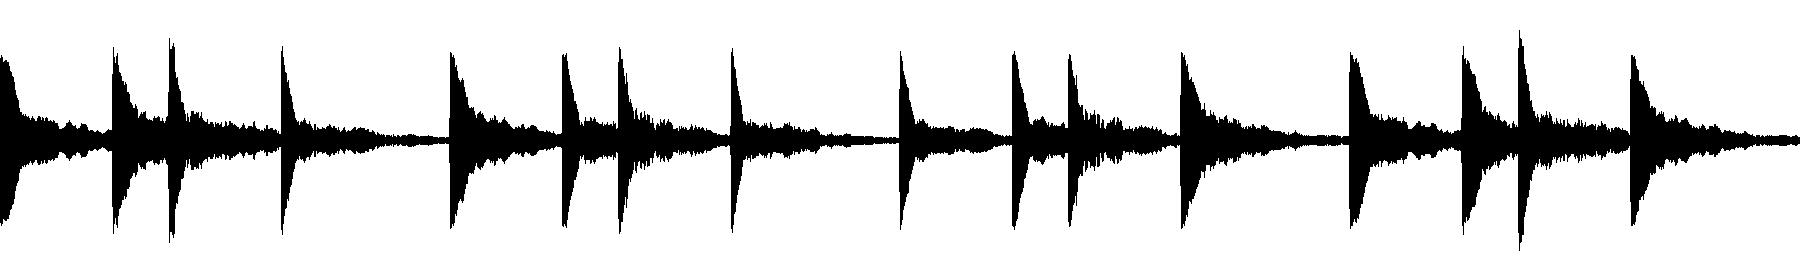 pluck melody    jv